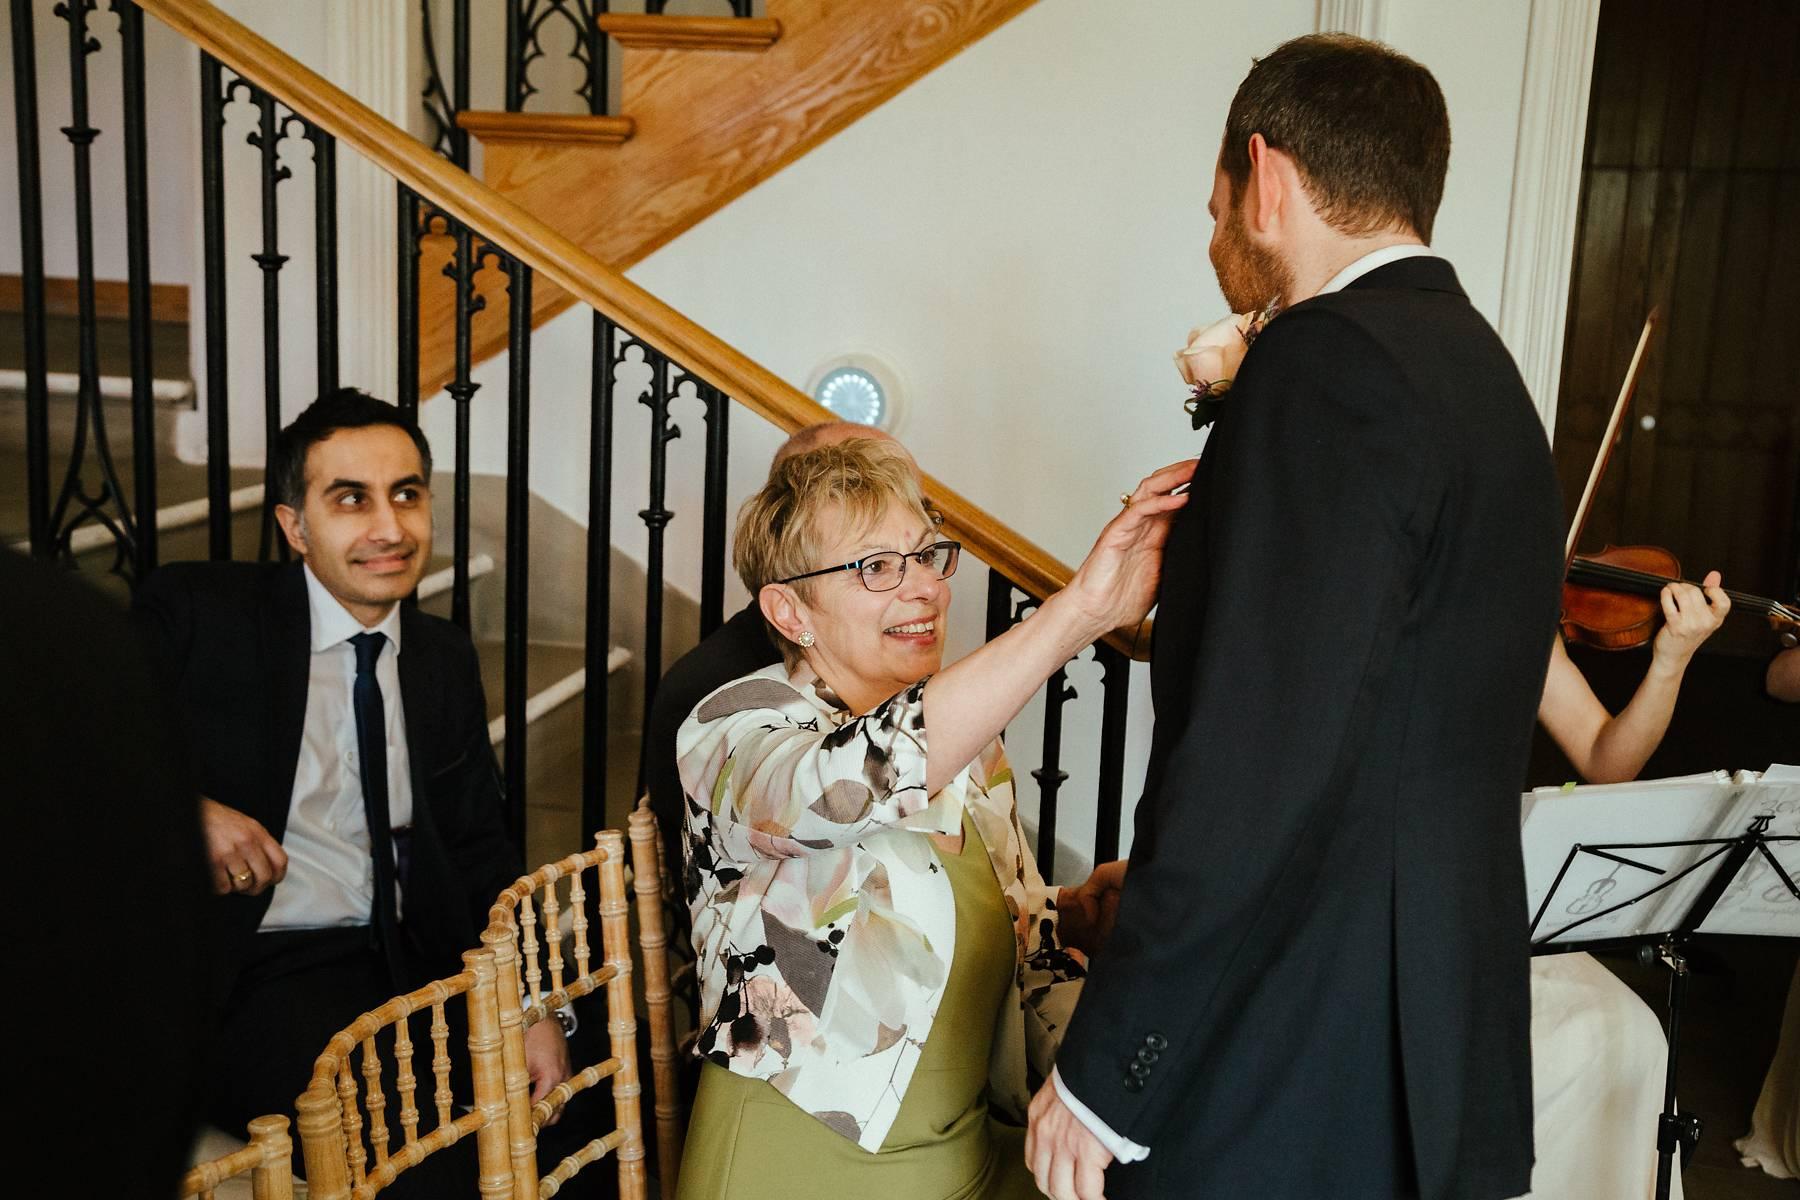 Mums jobs before wedding ceremony